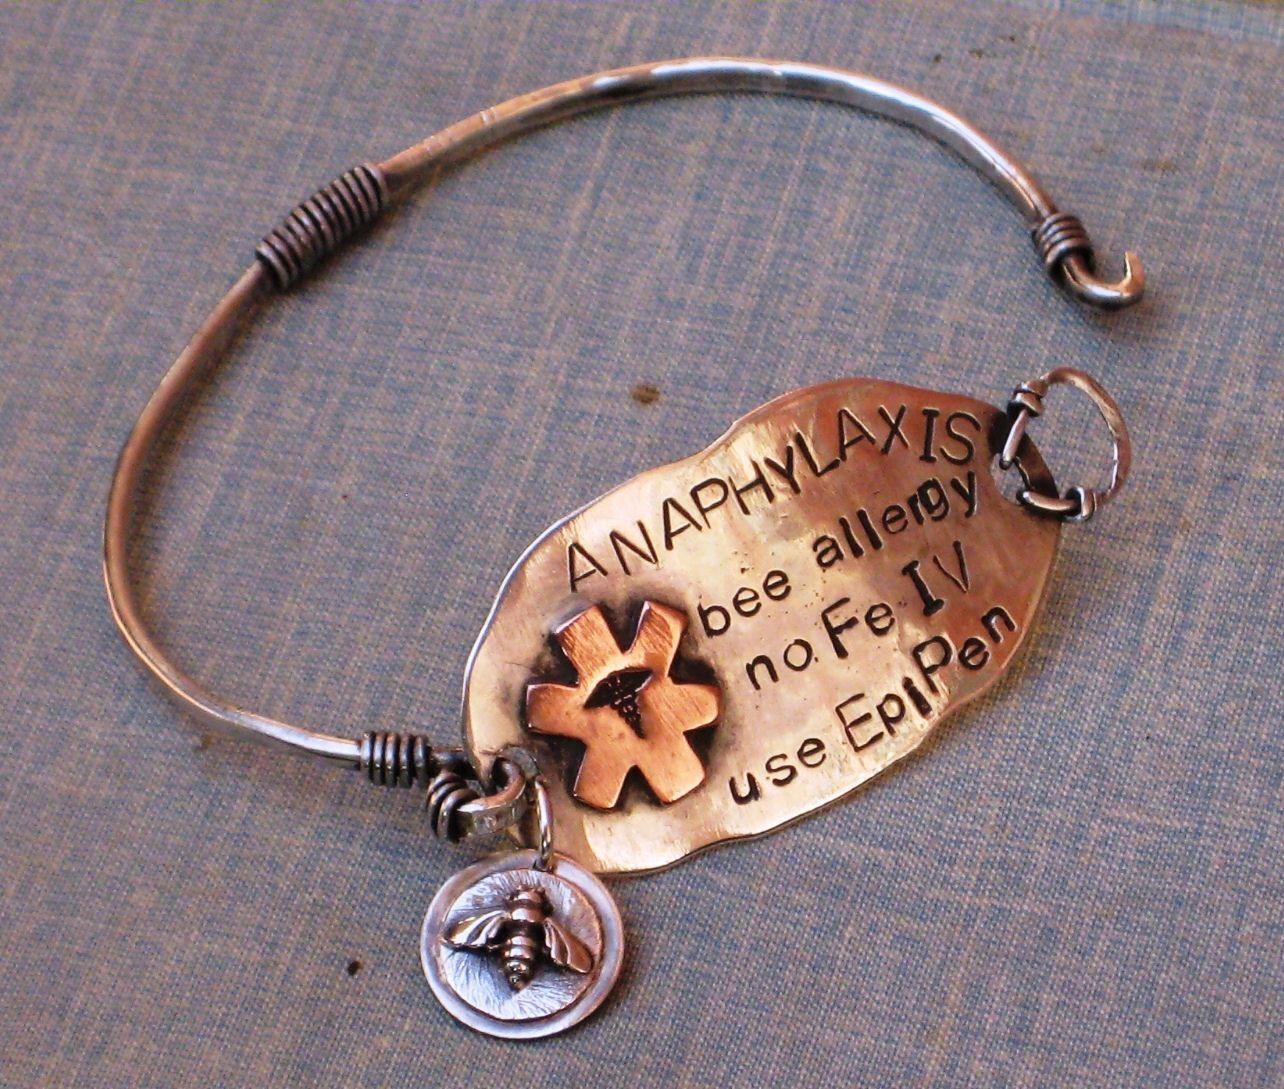 Medical Alert Jewerly Bw Silver Needing A Stylish Bracelet Stat